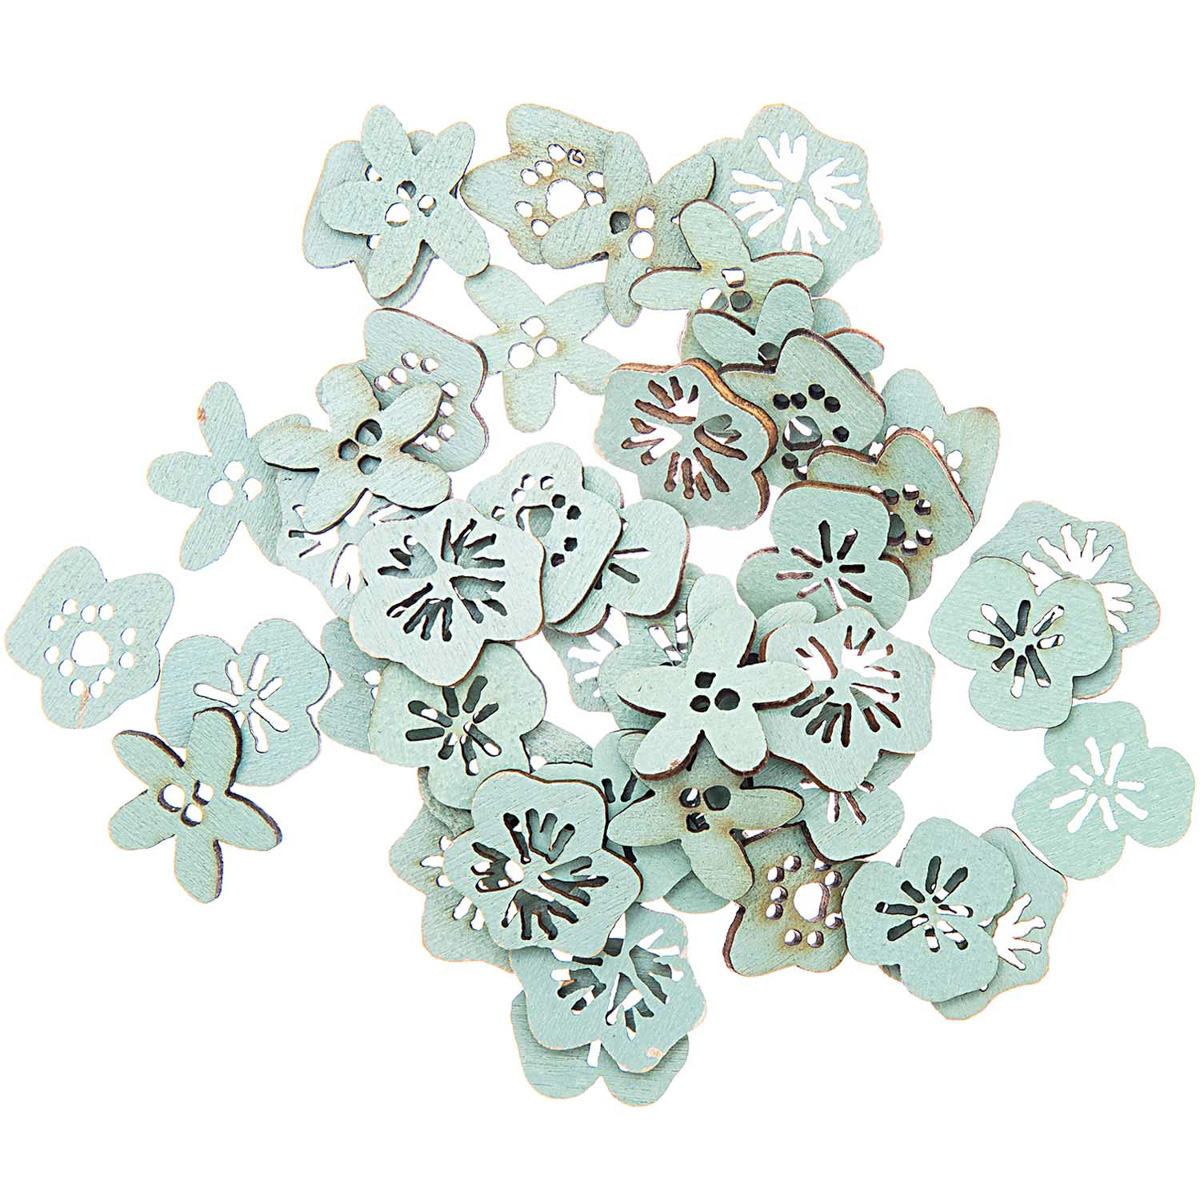 Rico Design Dekostreu Blüten Holz 48 tlg. grün